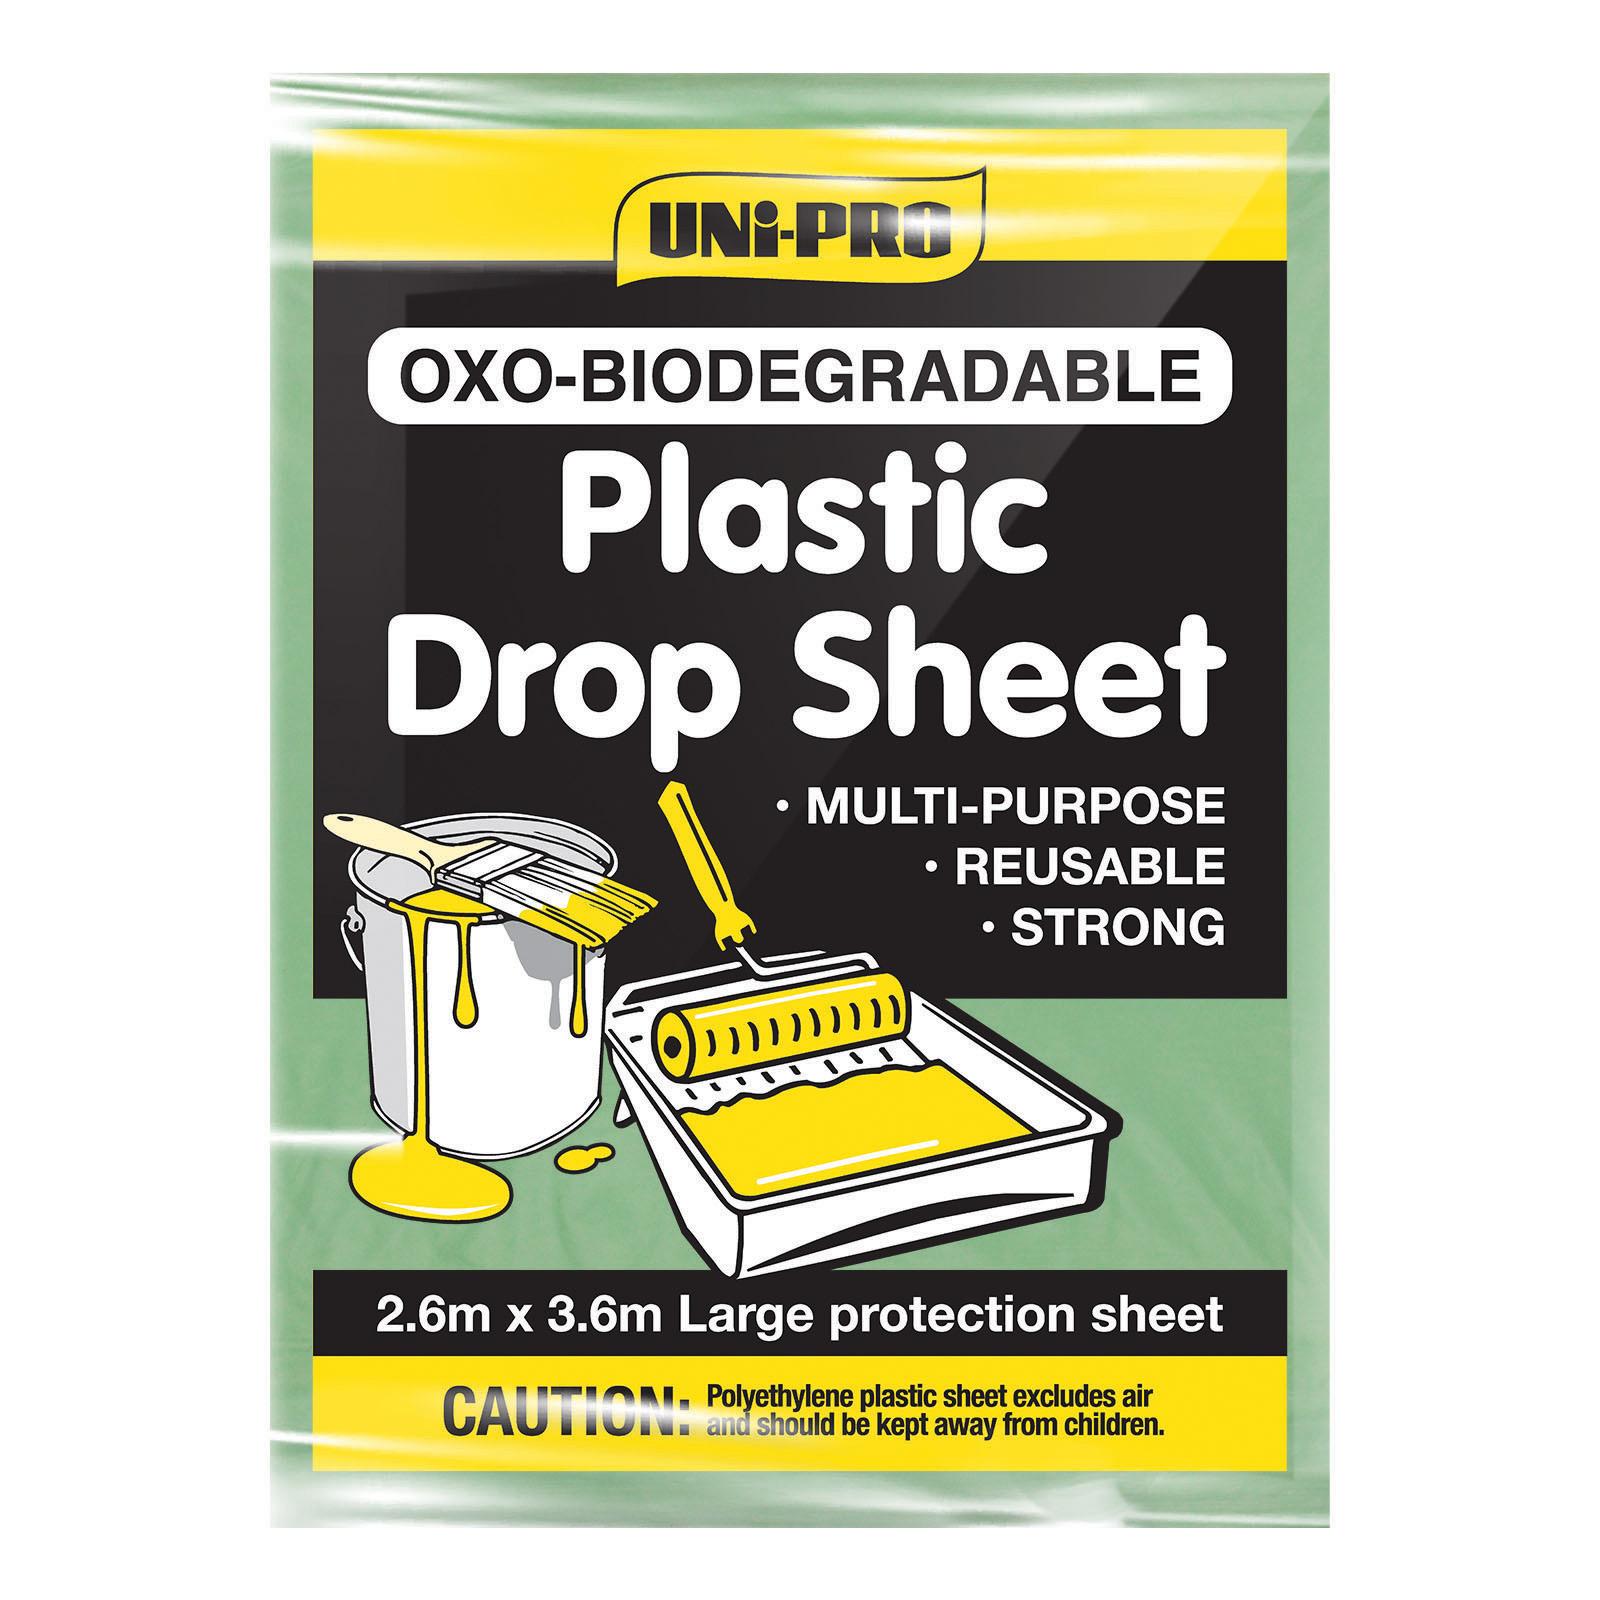 UNi-PRO Oxo-Biodegradable Light Duty Drop Sheet